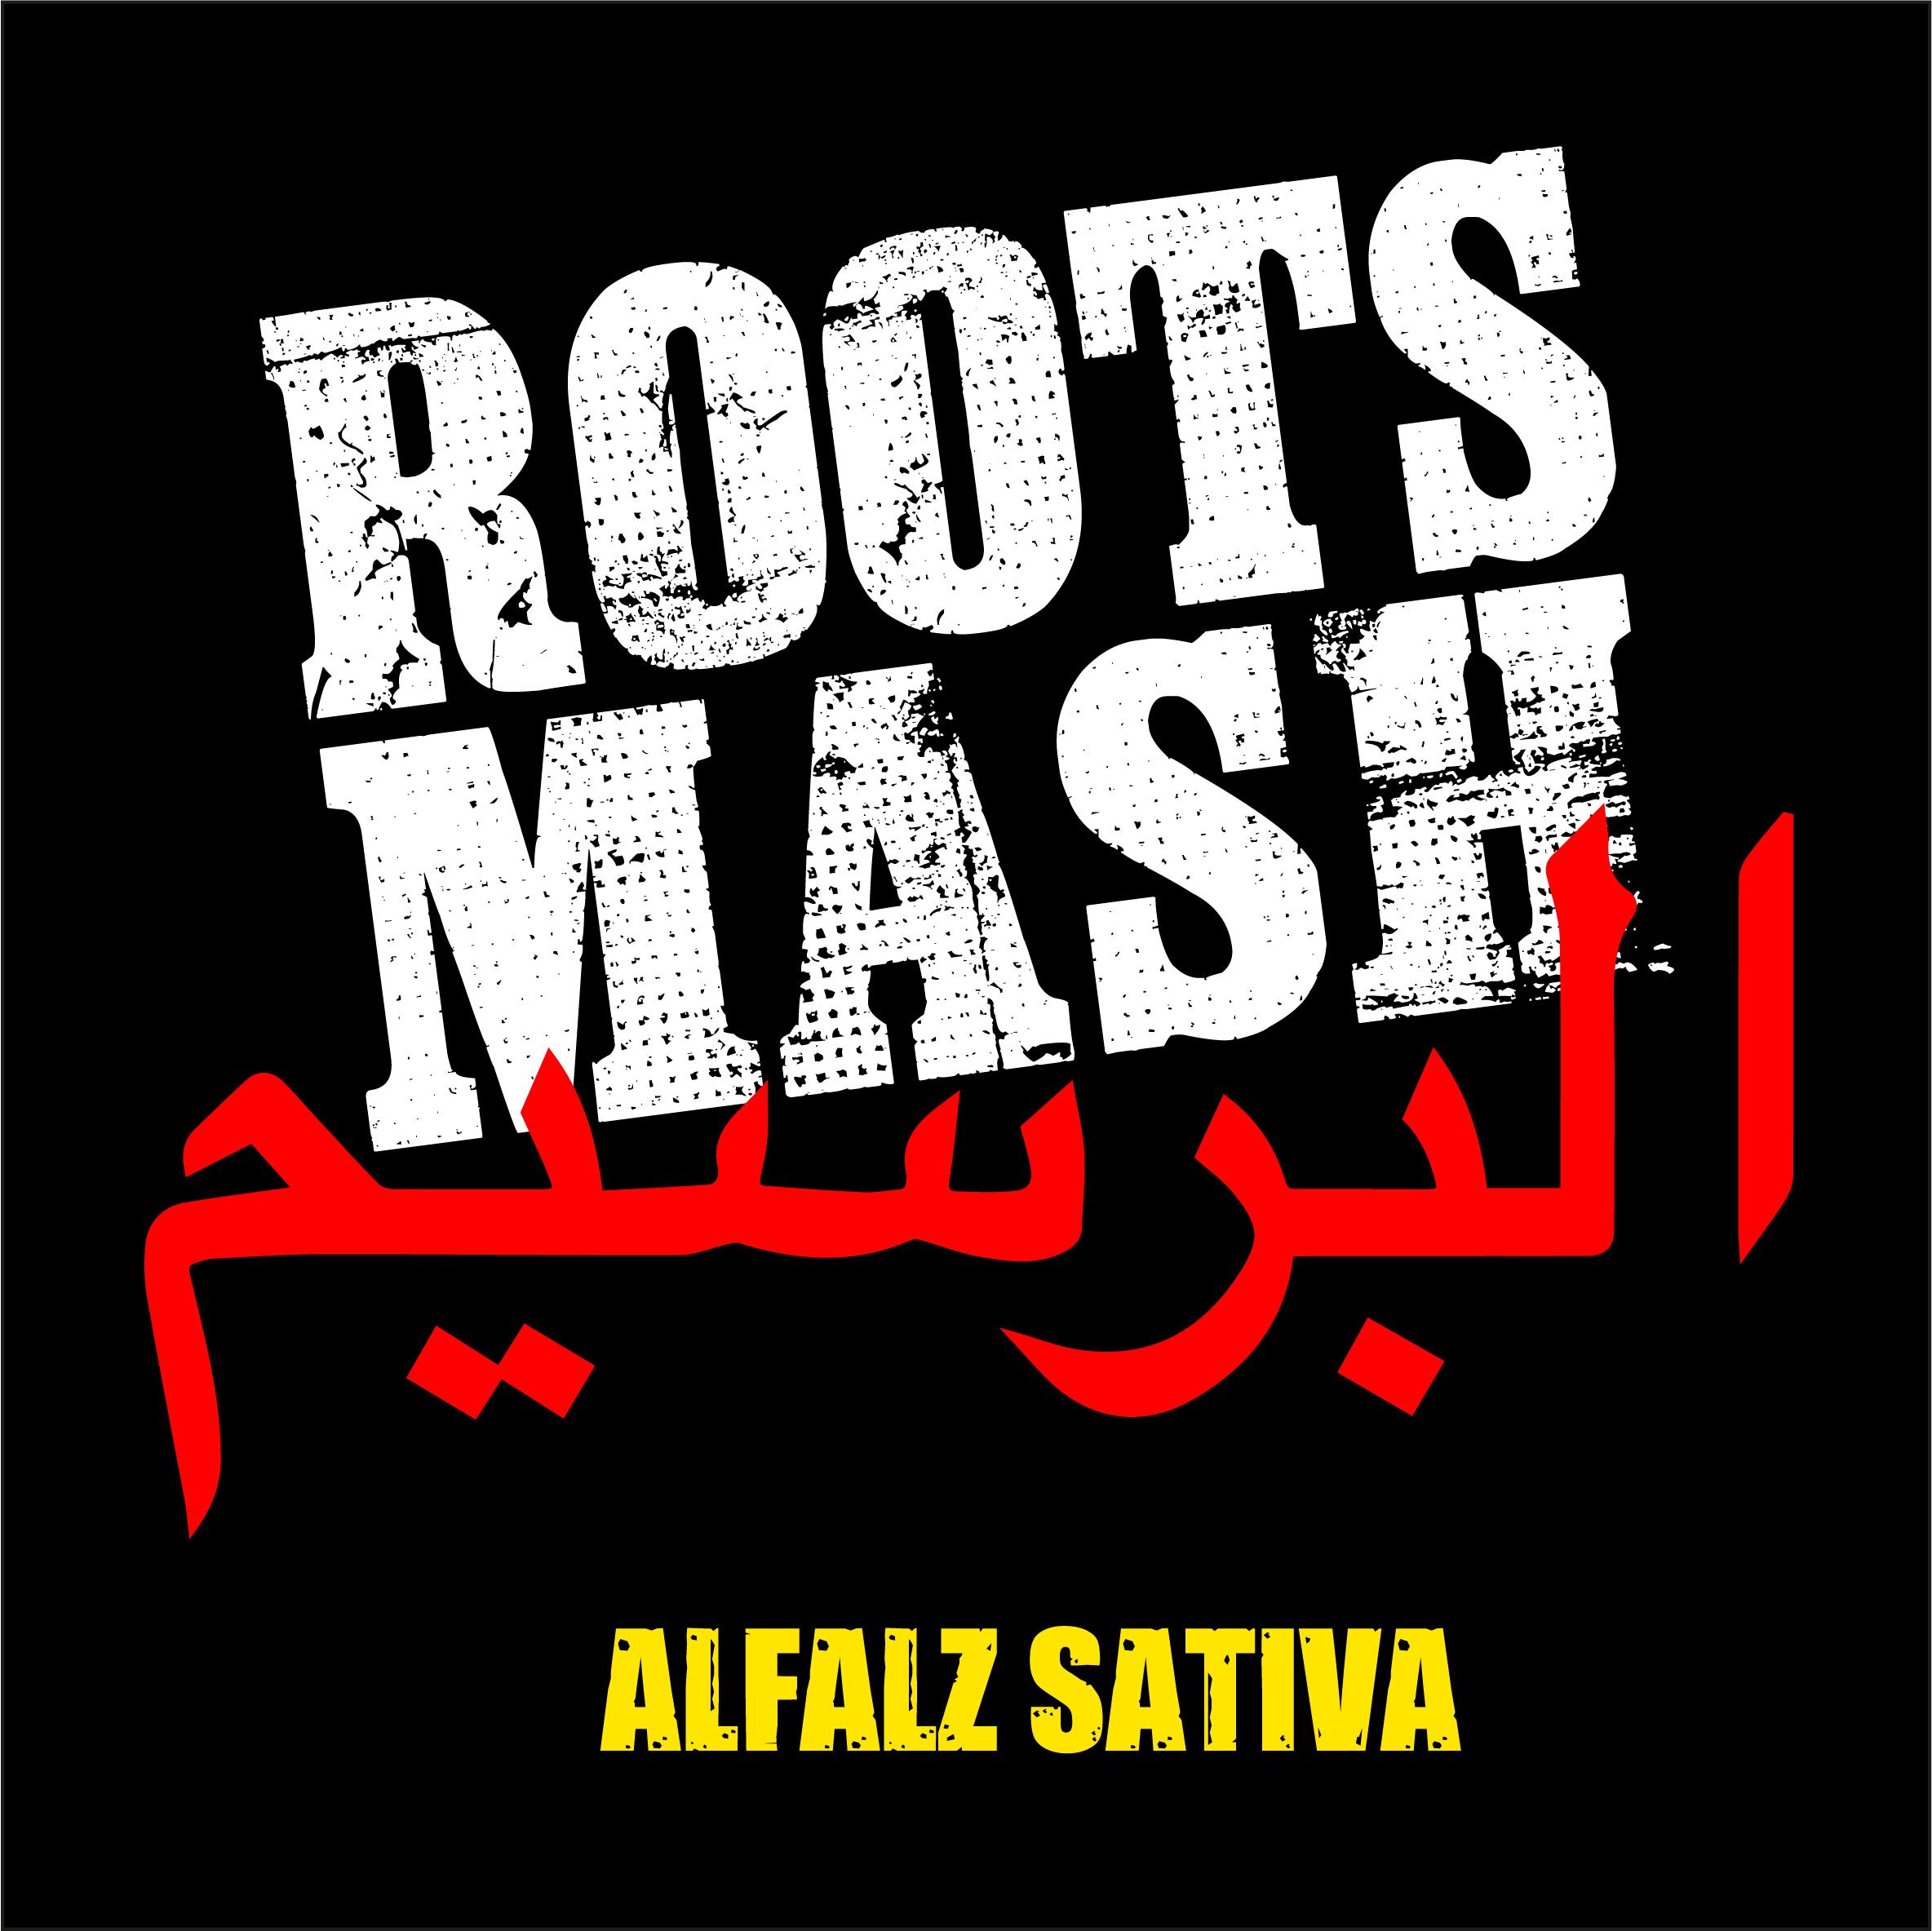 Roots-Mash_Alfalz-Sativa_Slipway-Records